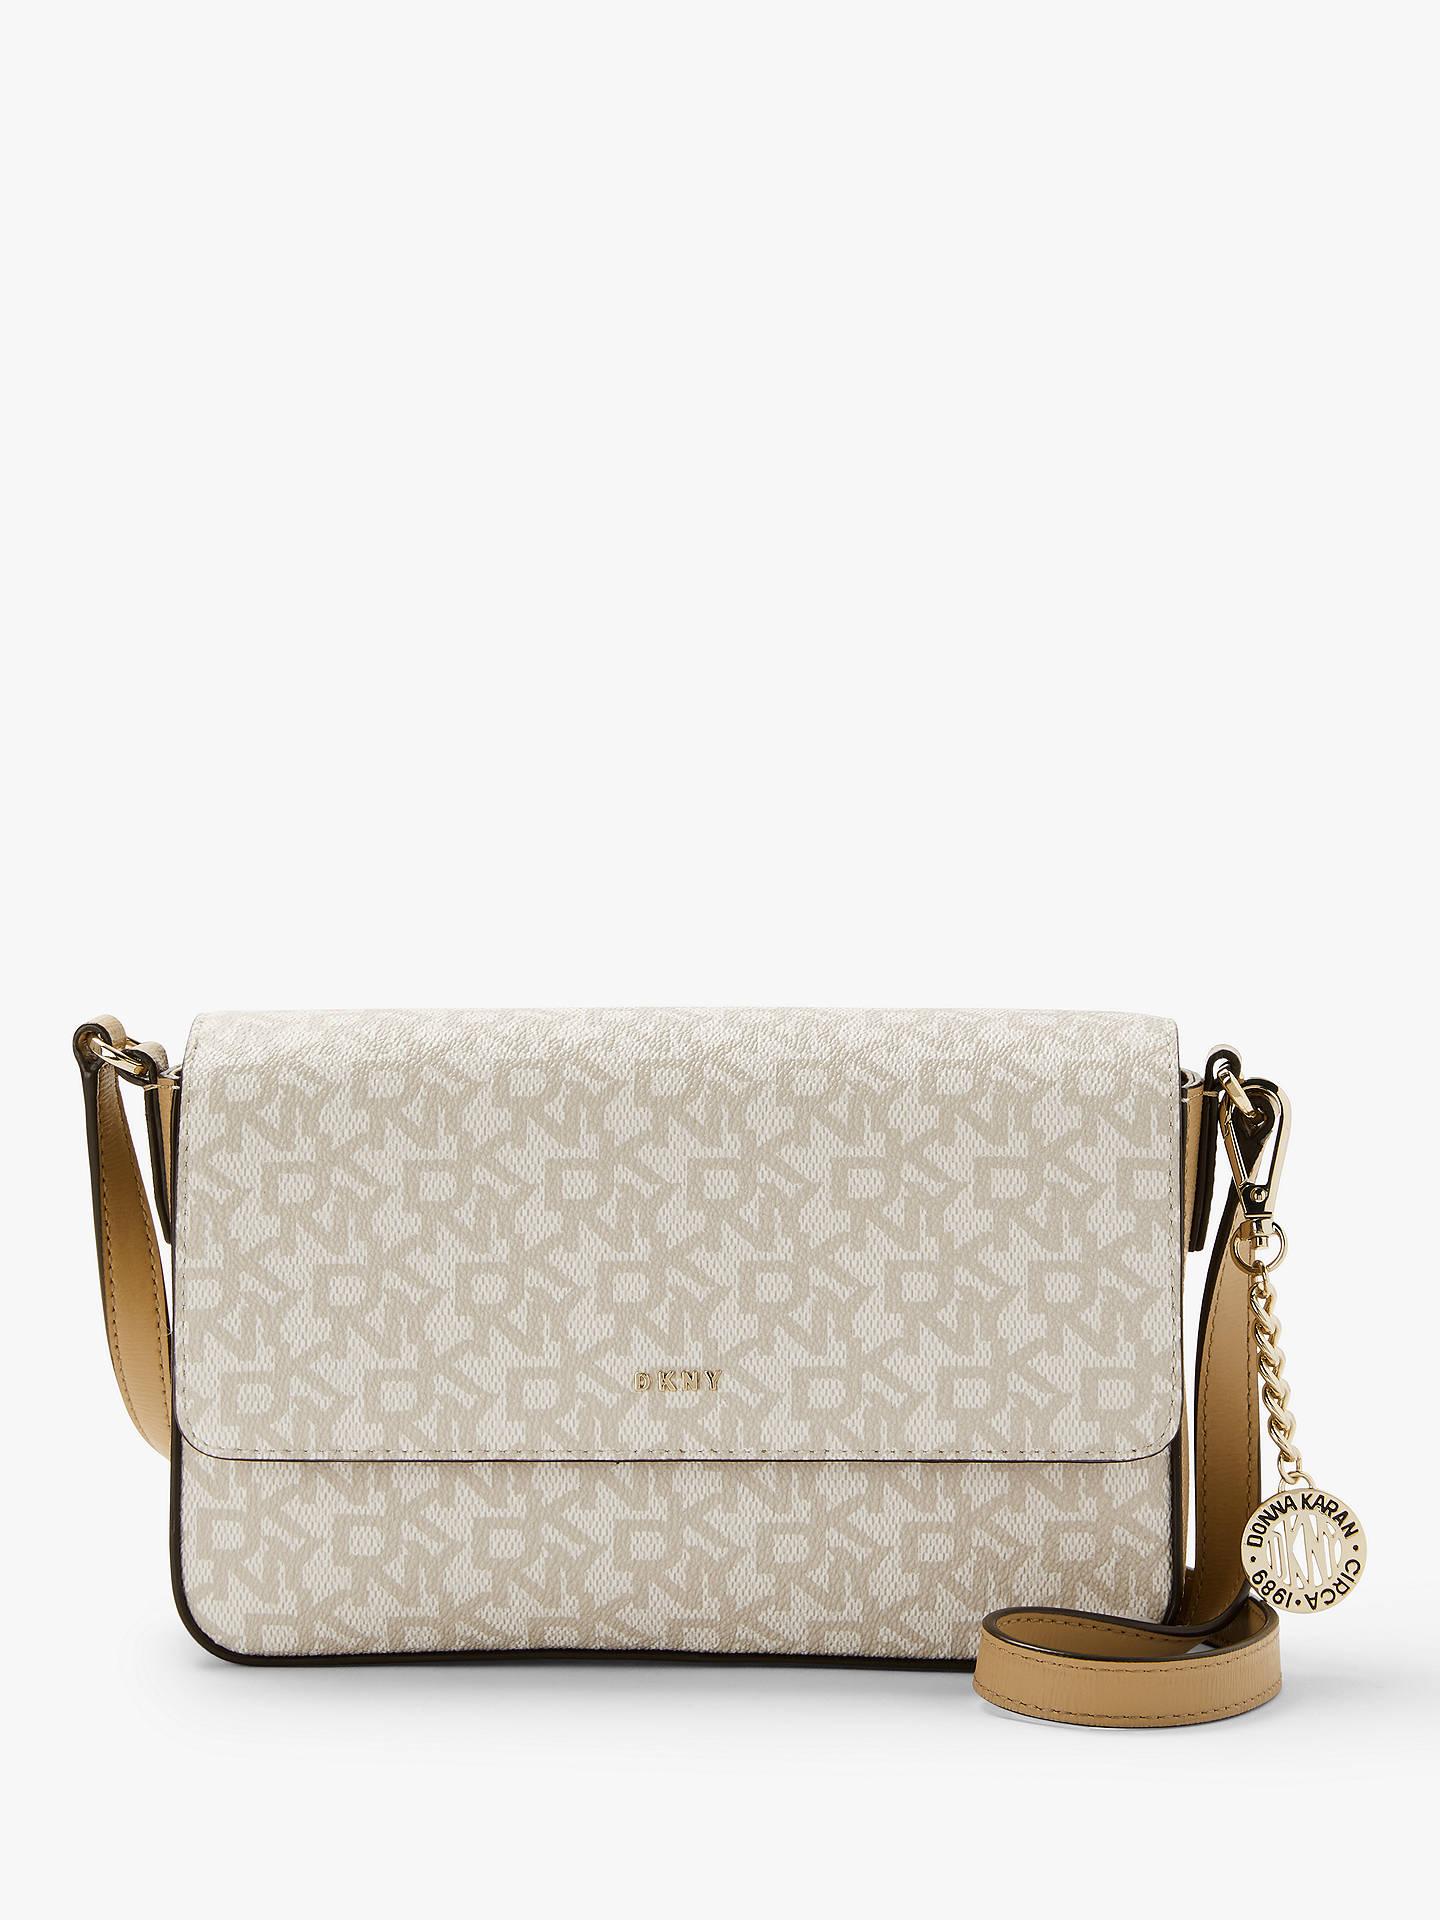 84de34bb3 Buy DKNY Bryant Logo Print Medium Flap Cross Body Bag, Hemp/Latte Online at  ...